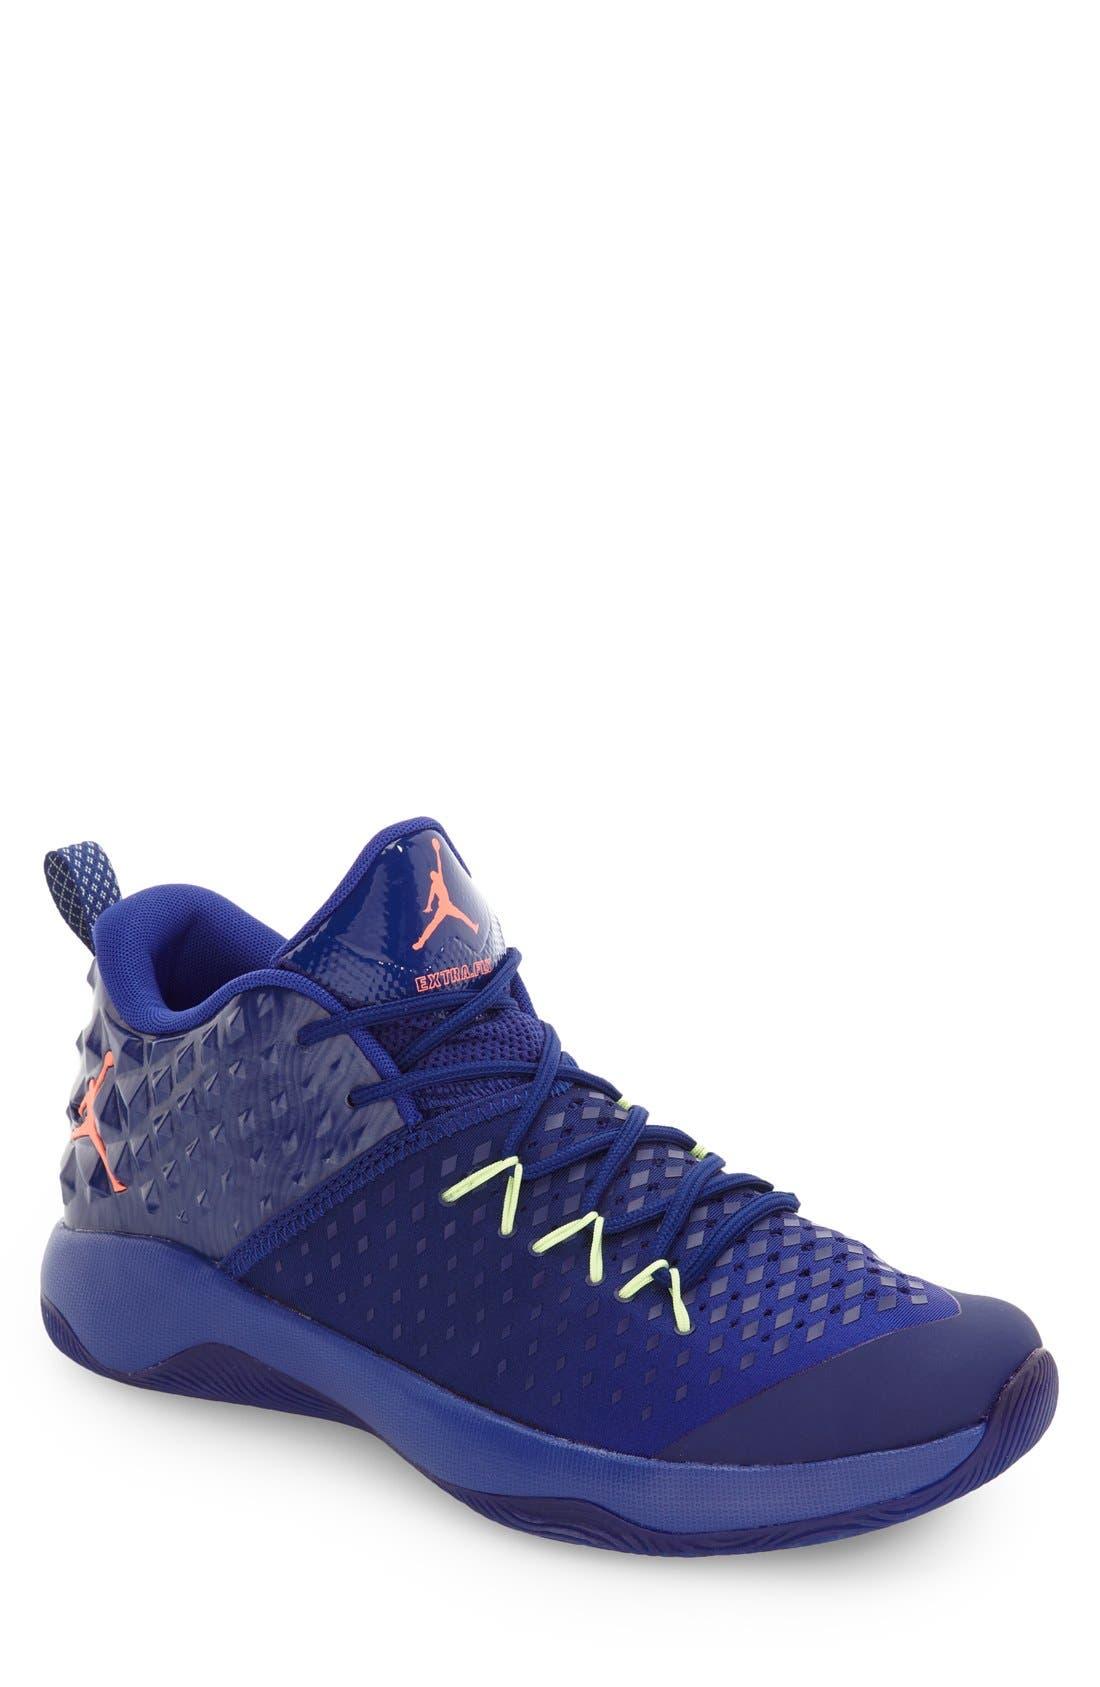 Main Image - Nike Jordan Extra Fly Sneaker (Men)